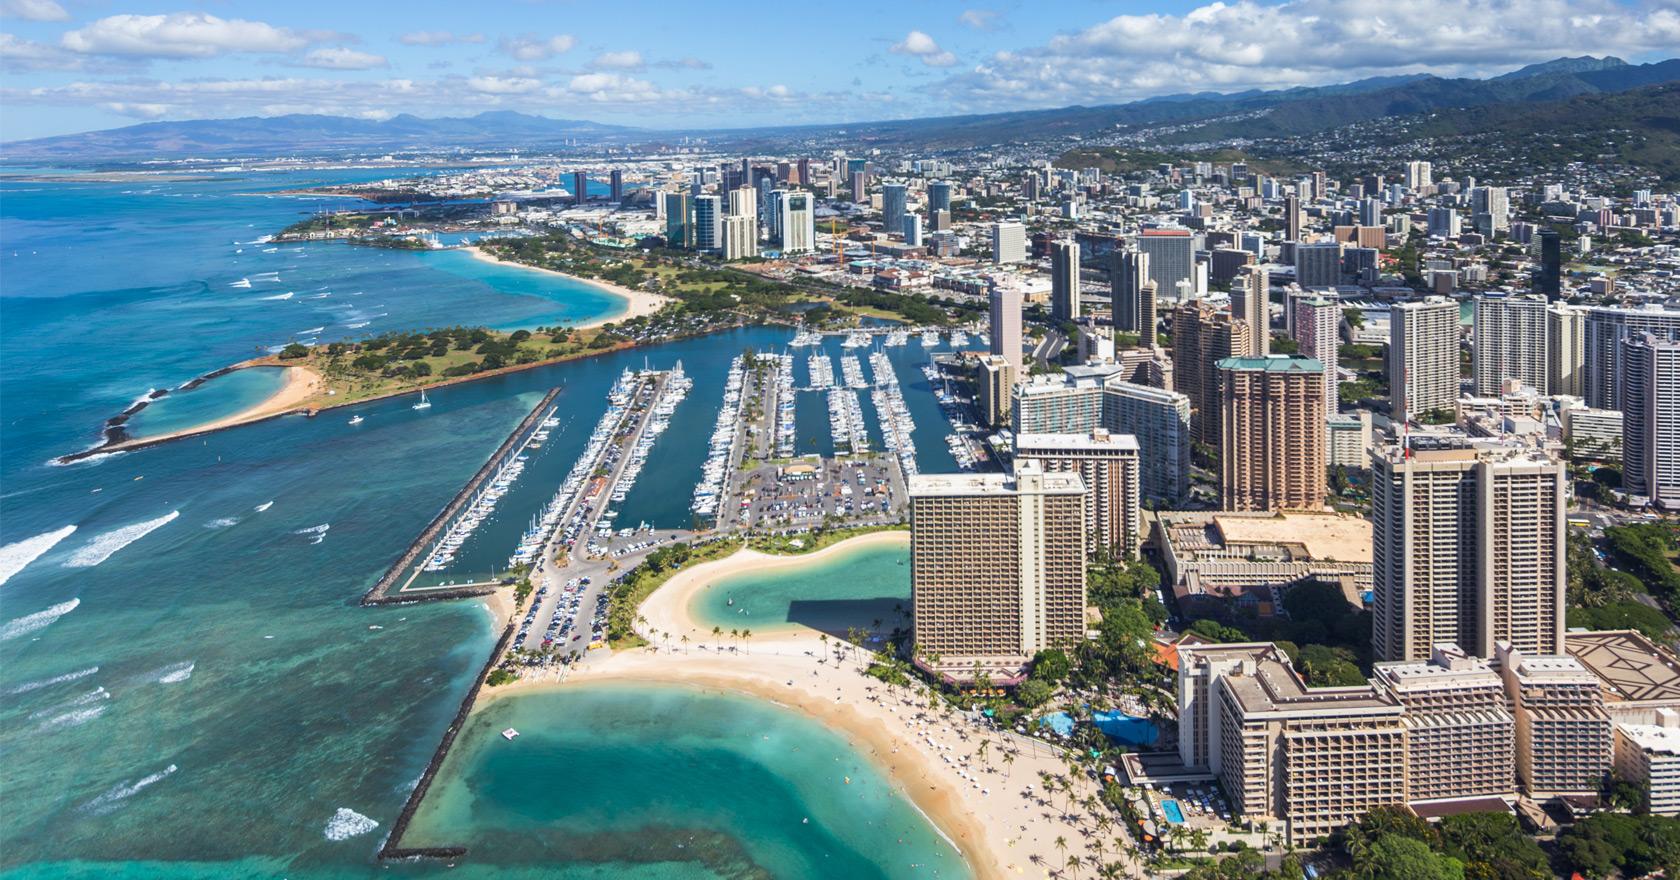 Grand Islander by Hilton Grand Vacations 2019 Maintenance